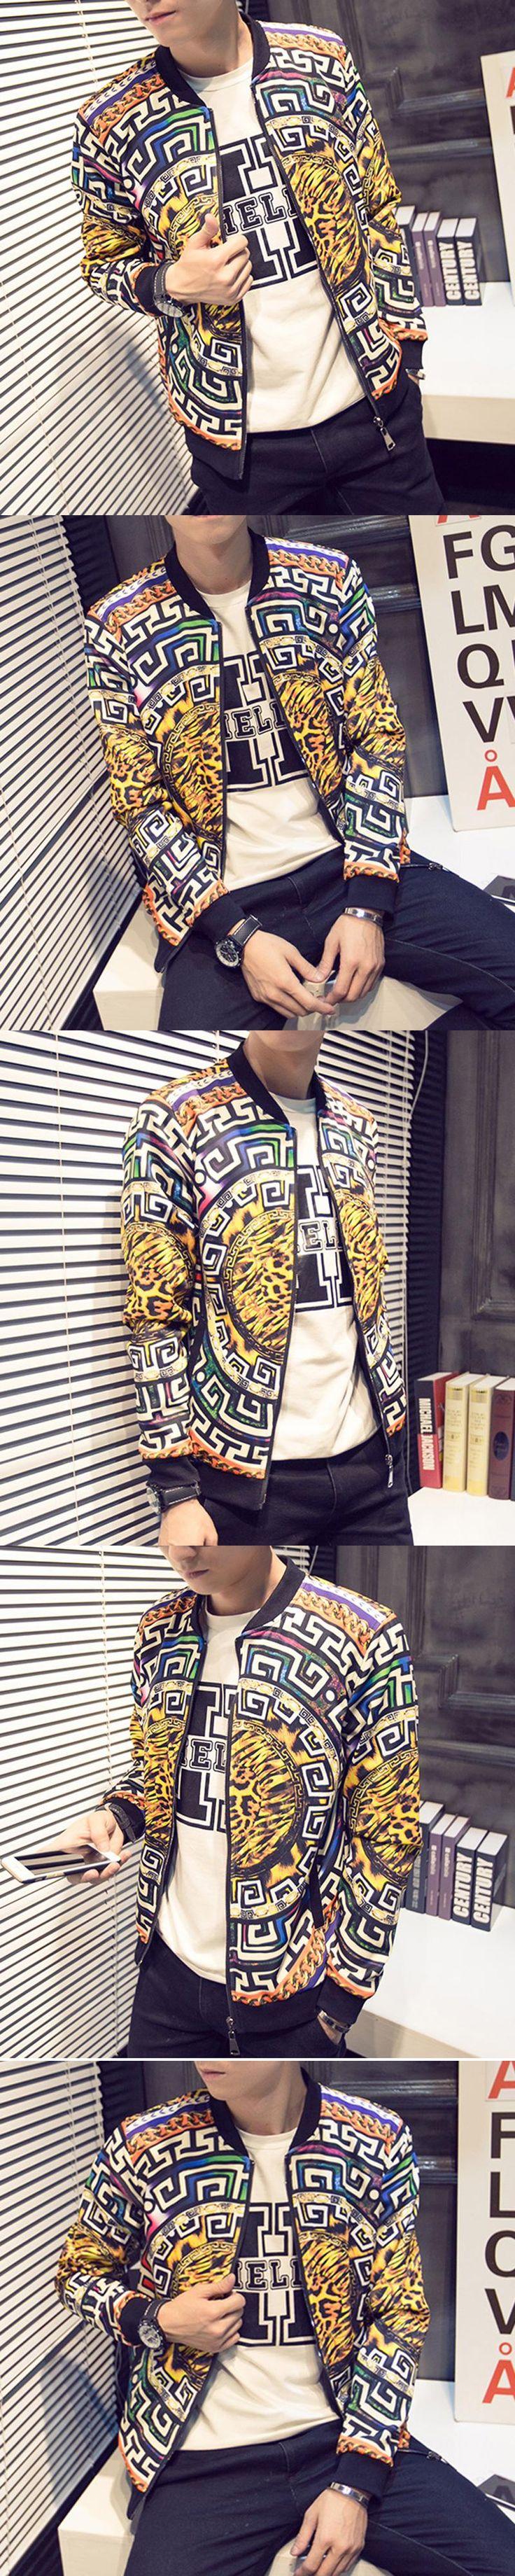 New 2016 autumn chinese style fashion geometry and leopard print bomber jacket men veste homme men's clothing size m-4xl JK3-1